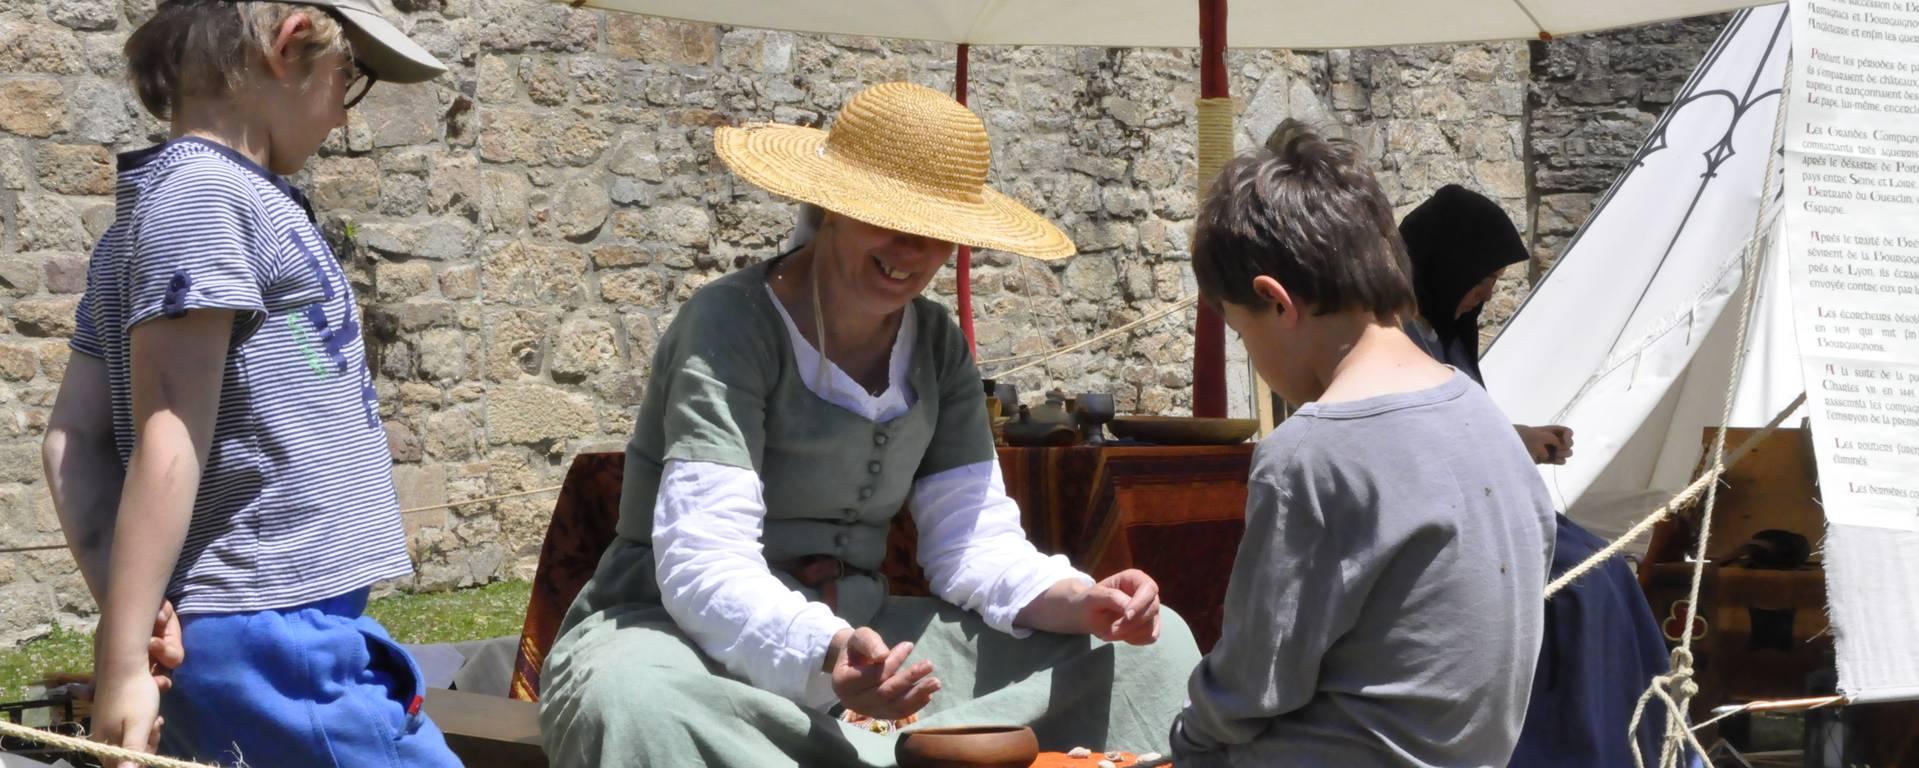 fête médiévale Guémené-sur-ScorffScorff